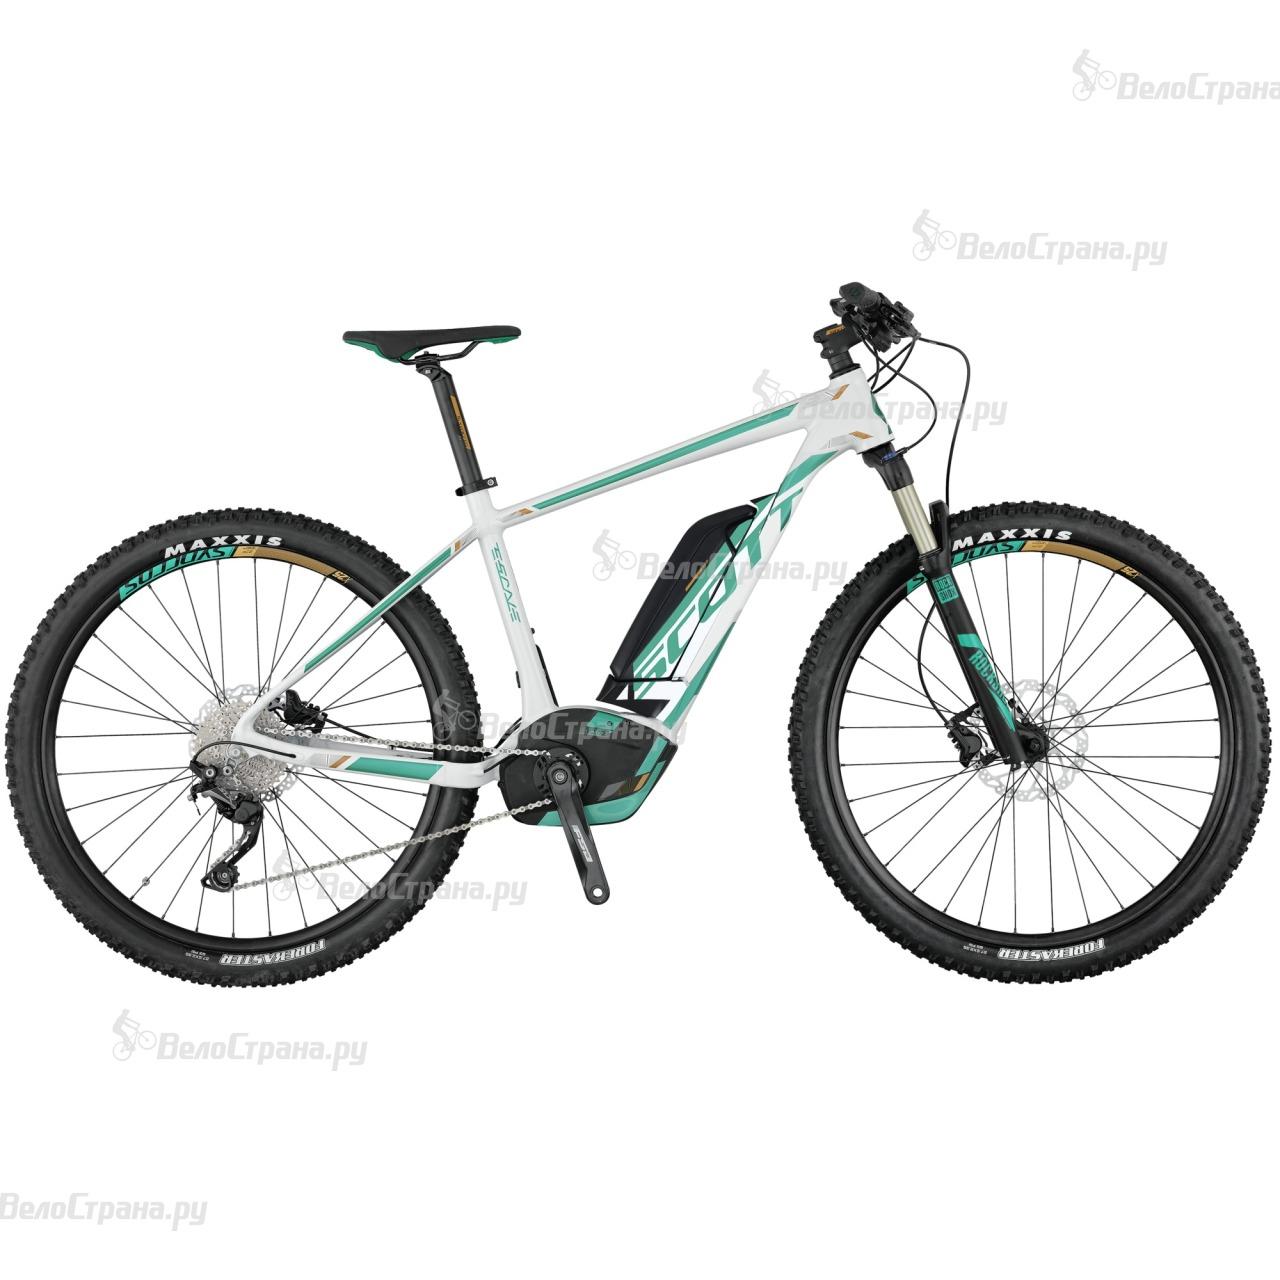 Велосипед Scott E-Contessa Scale 730 (2017) велосипед scott contessa solace 15 compact 2015